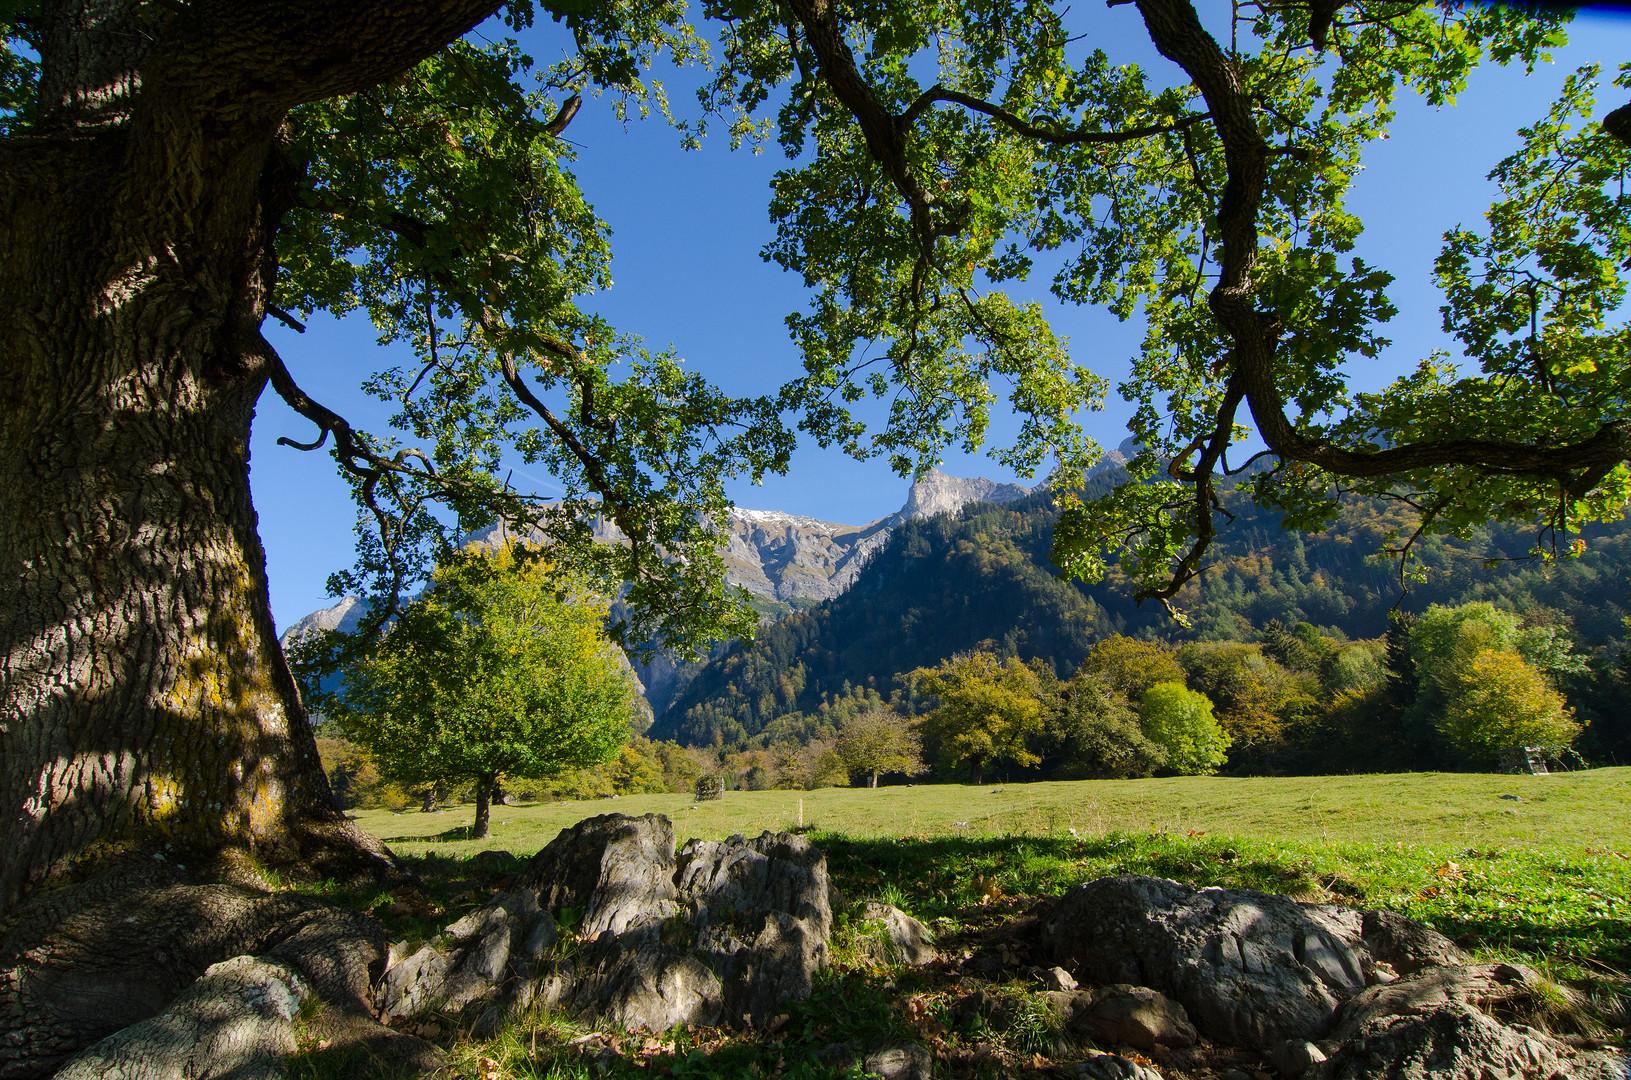 Herbst im Heidiland